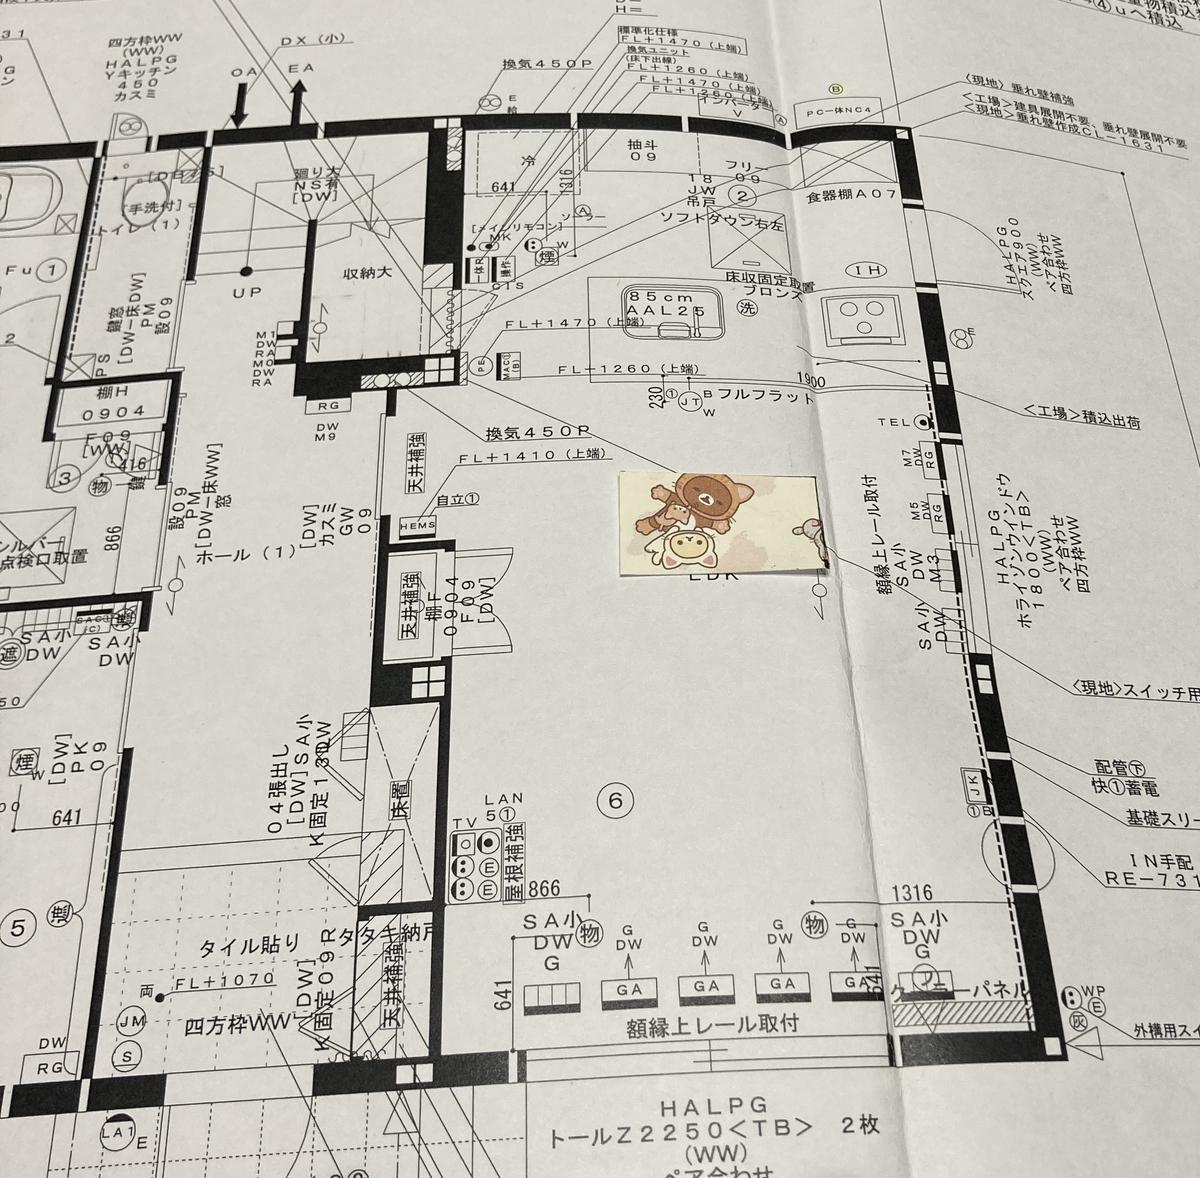 f:id:kinako_0128:20210413123240j:plain